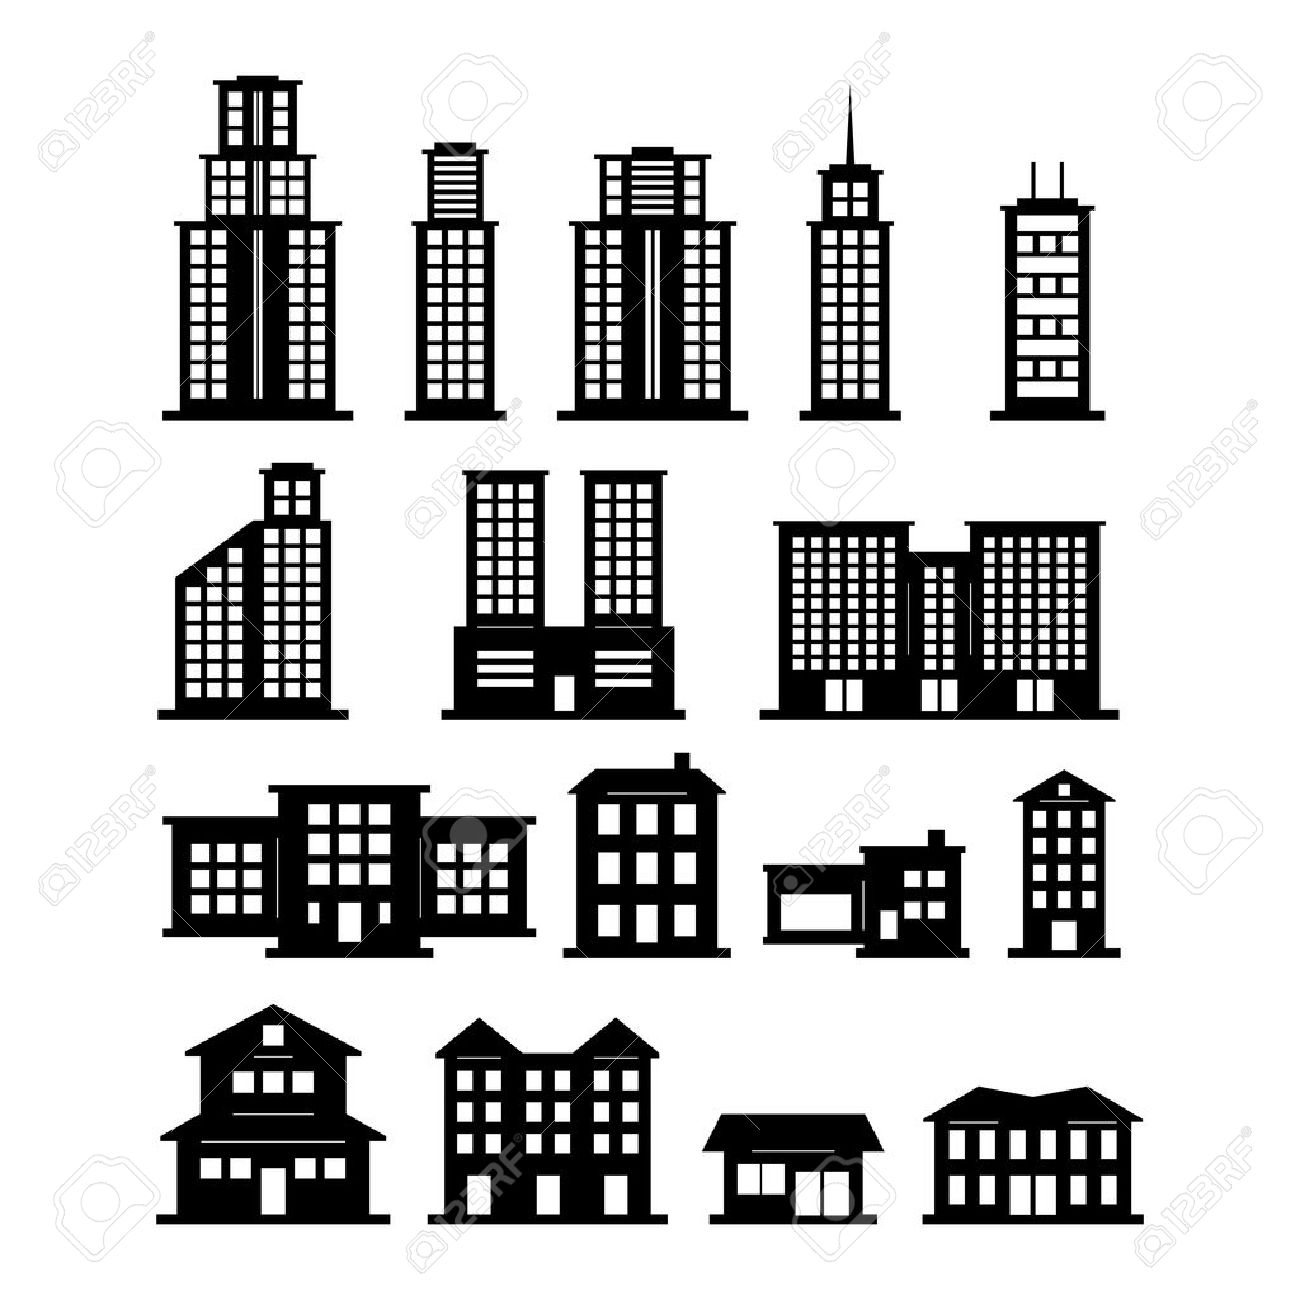 building vector royalty free cliparts vectors and stock rh 123rf com building vector logo building vector free download